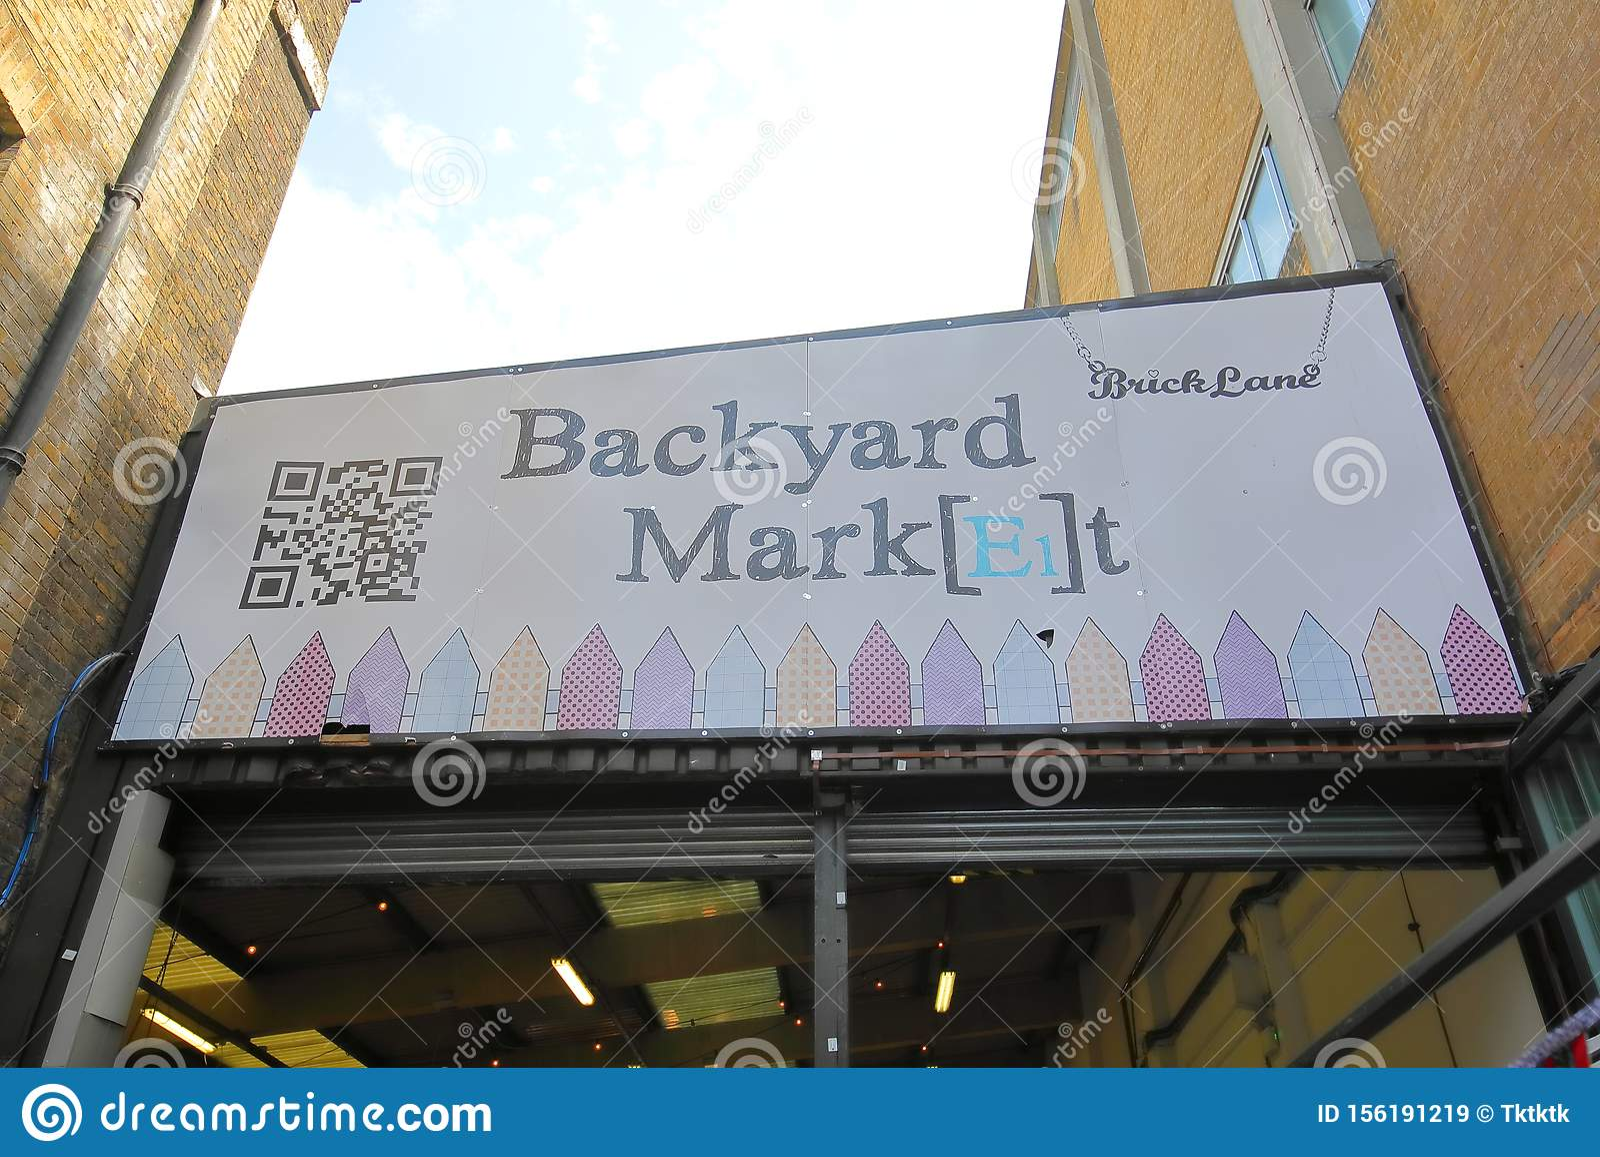 Backyard Market At Brick Lane Sunday Market London UK ...